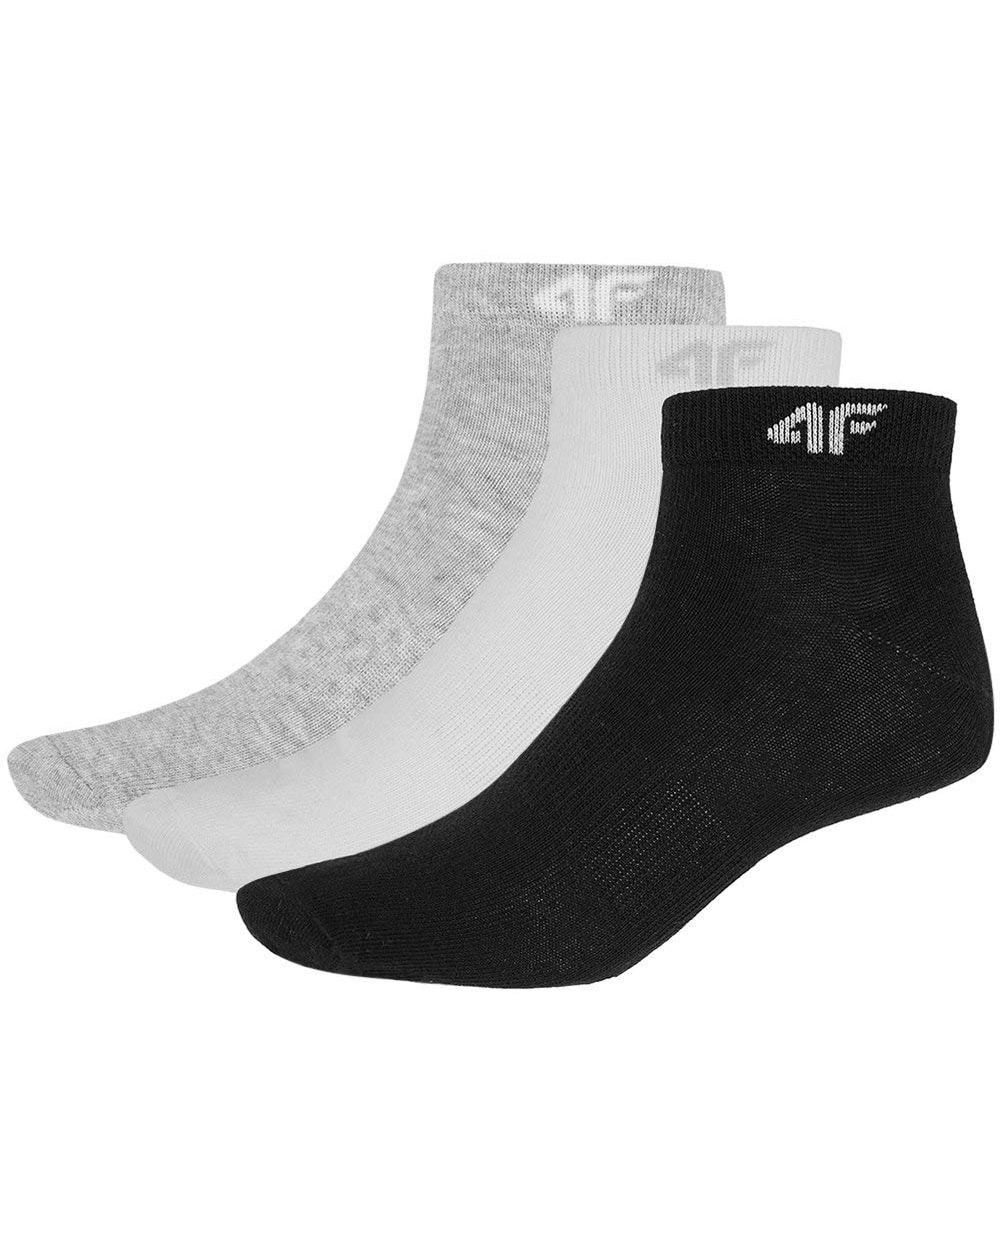 4F Womens Socks White Black Grey sod001